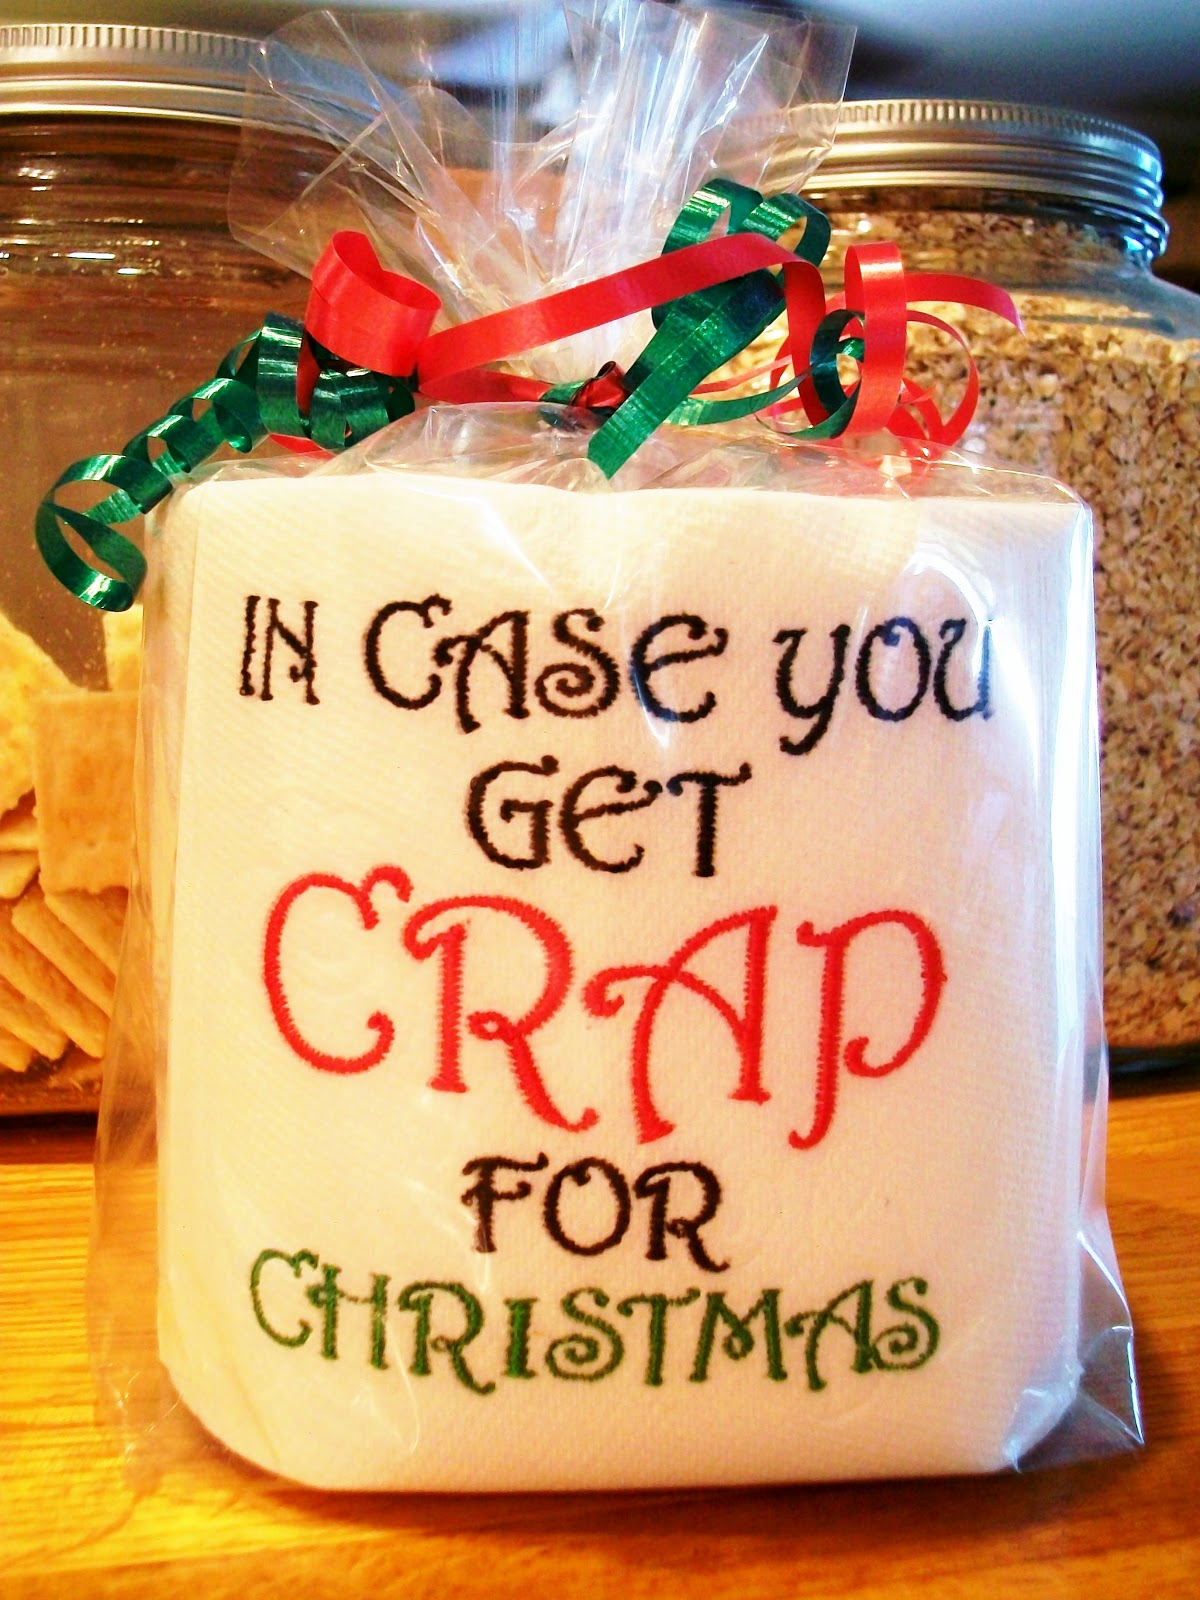 30 Christmas Gifts in a Jar - unOriginal Mom |Fun Christmas Gift Ideas